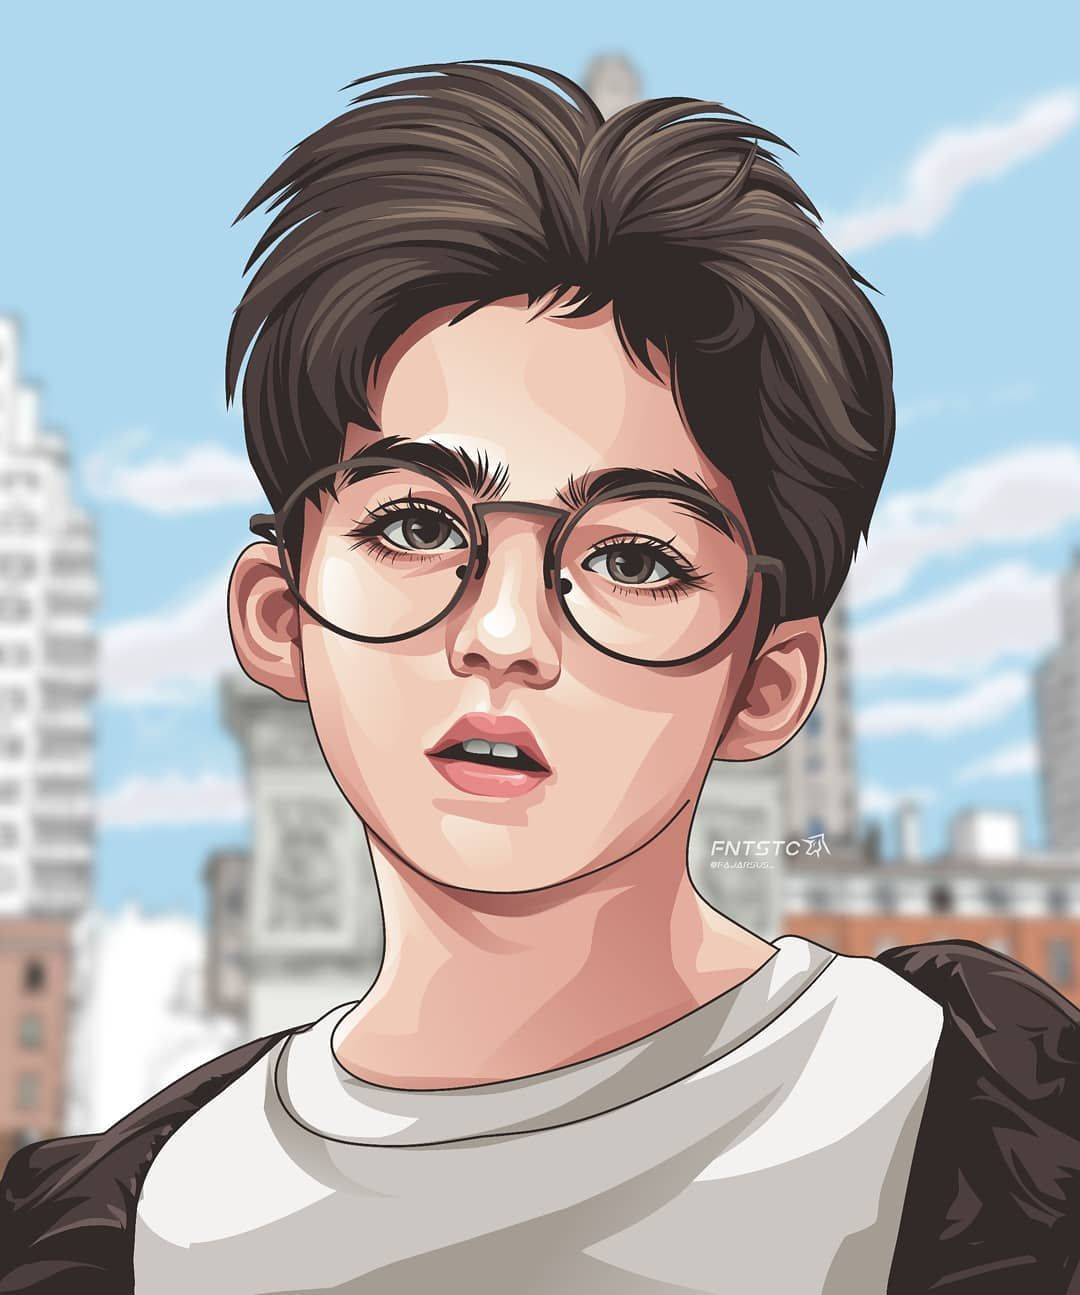 Cartoon Dp Boy Hd Photos For Whatsapp Cute Alone Etc Image Diamond